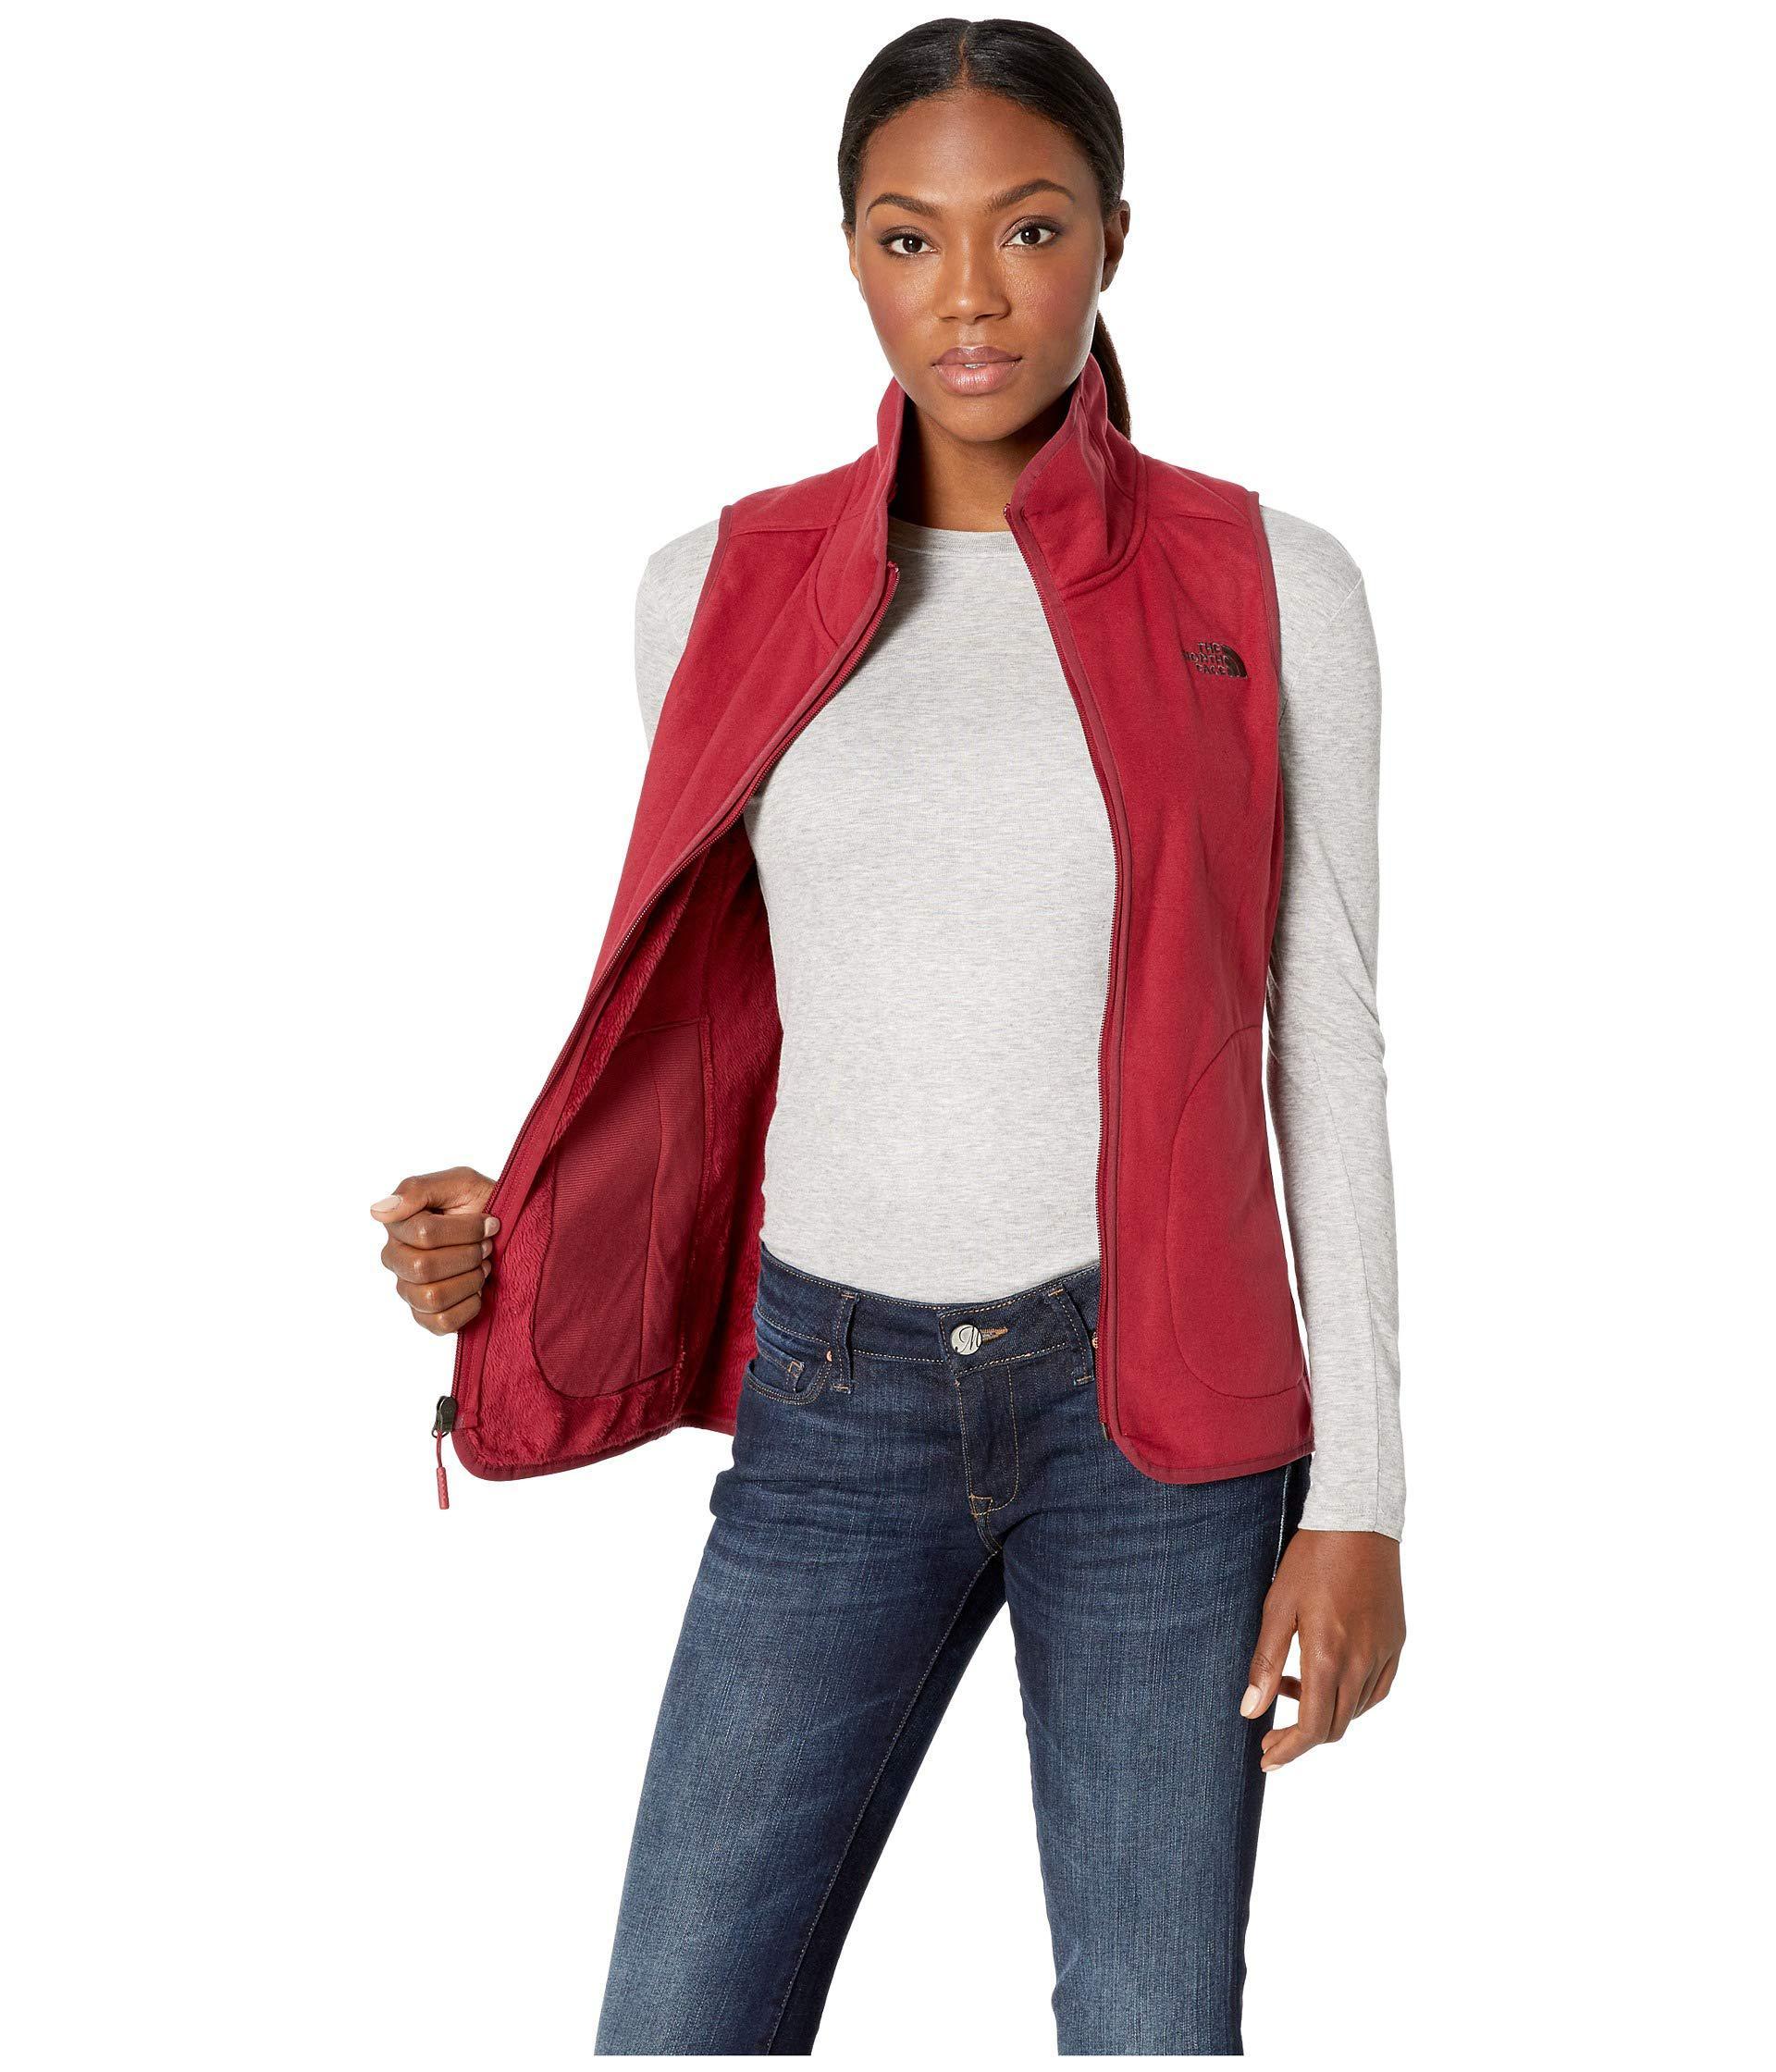 e610a5301e8c ... Red Mosswood Vest (tnf Black) Women s Vest - Lyst. View fullscreen